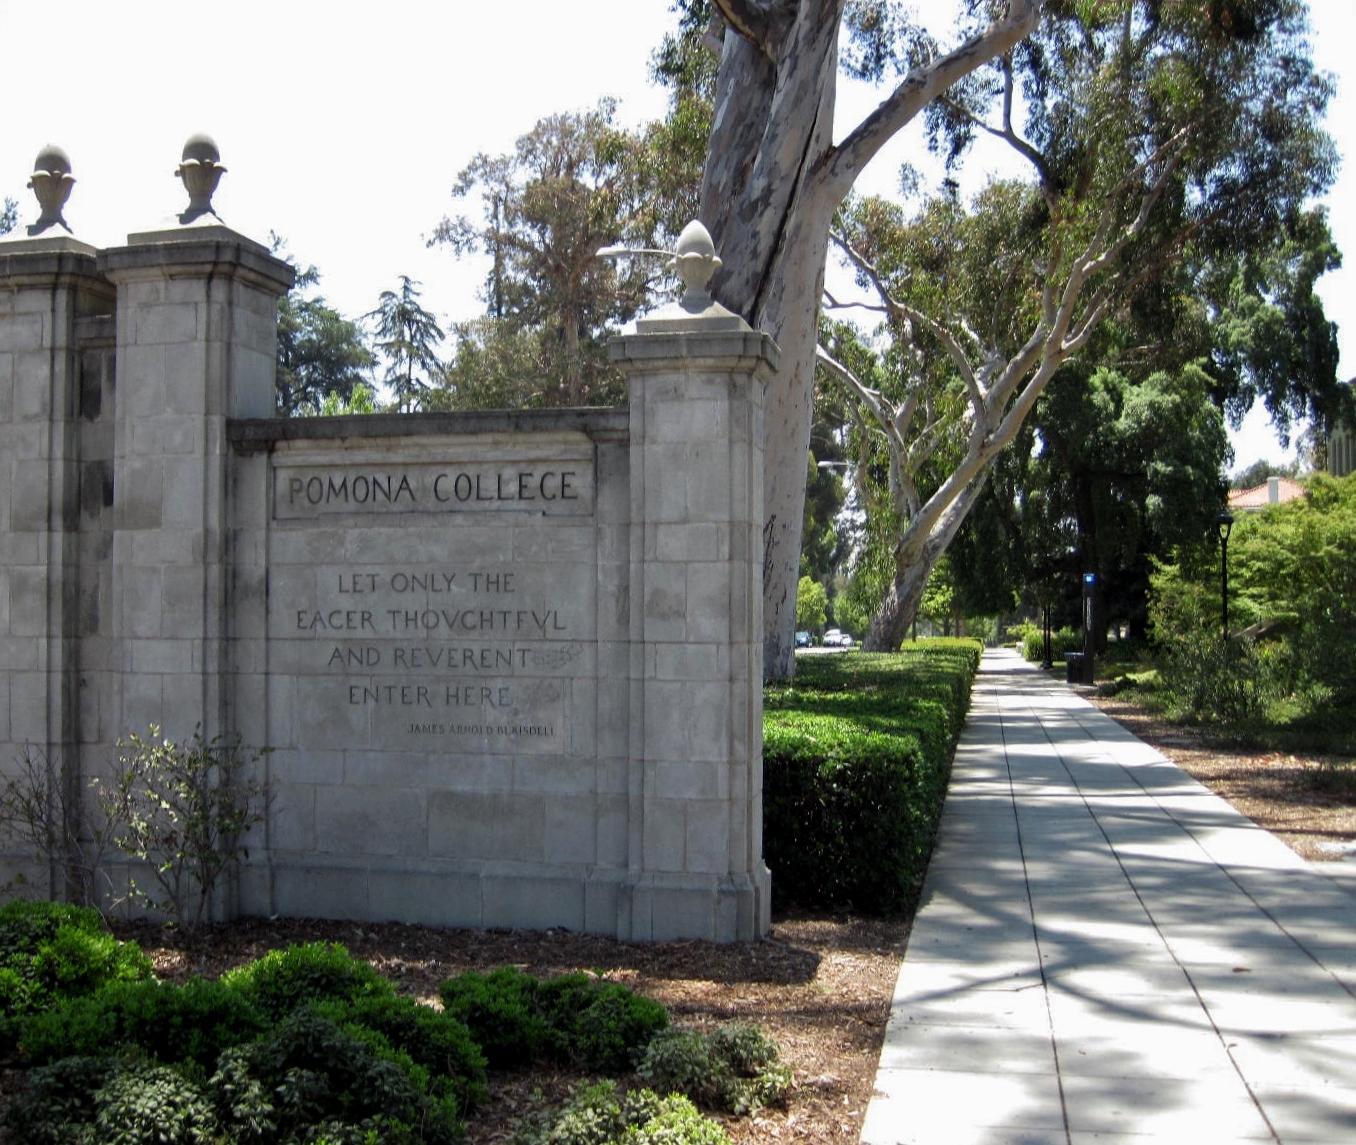 Pomona College In Claremont California Pomona College: House Sitting In Rancho Cucamonga